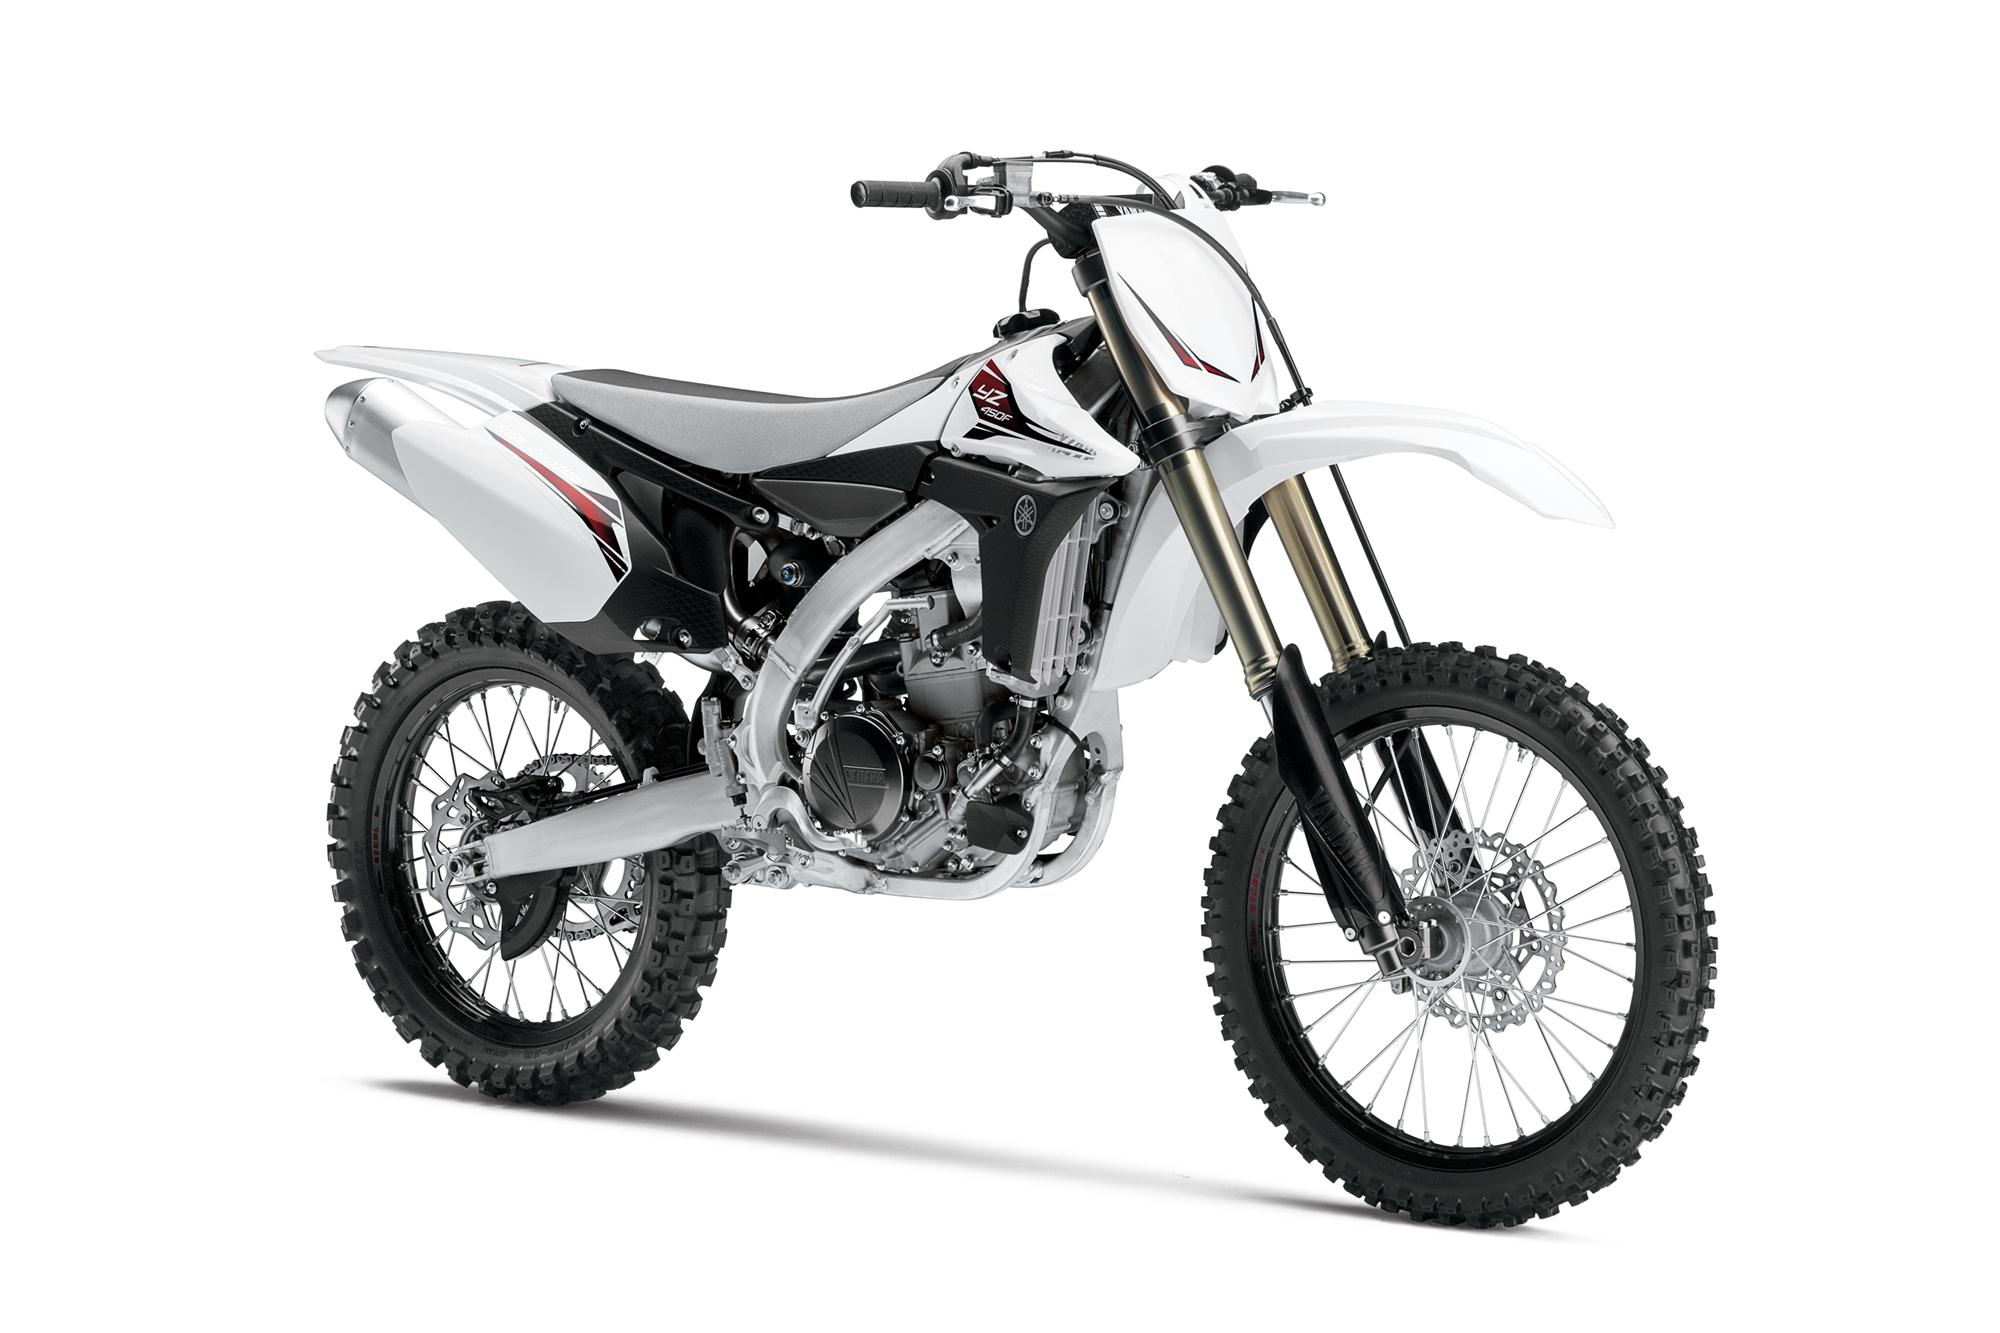 Yamaha Yz450f A Fun And Powerful Dirt Beast